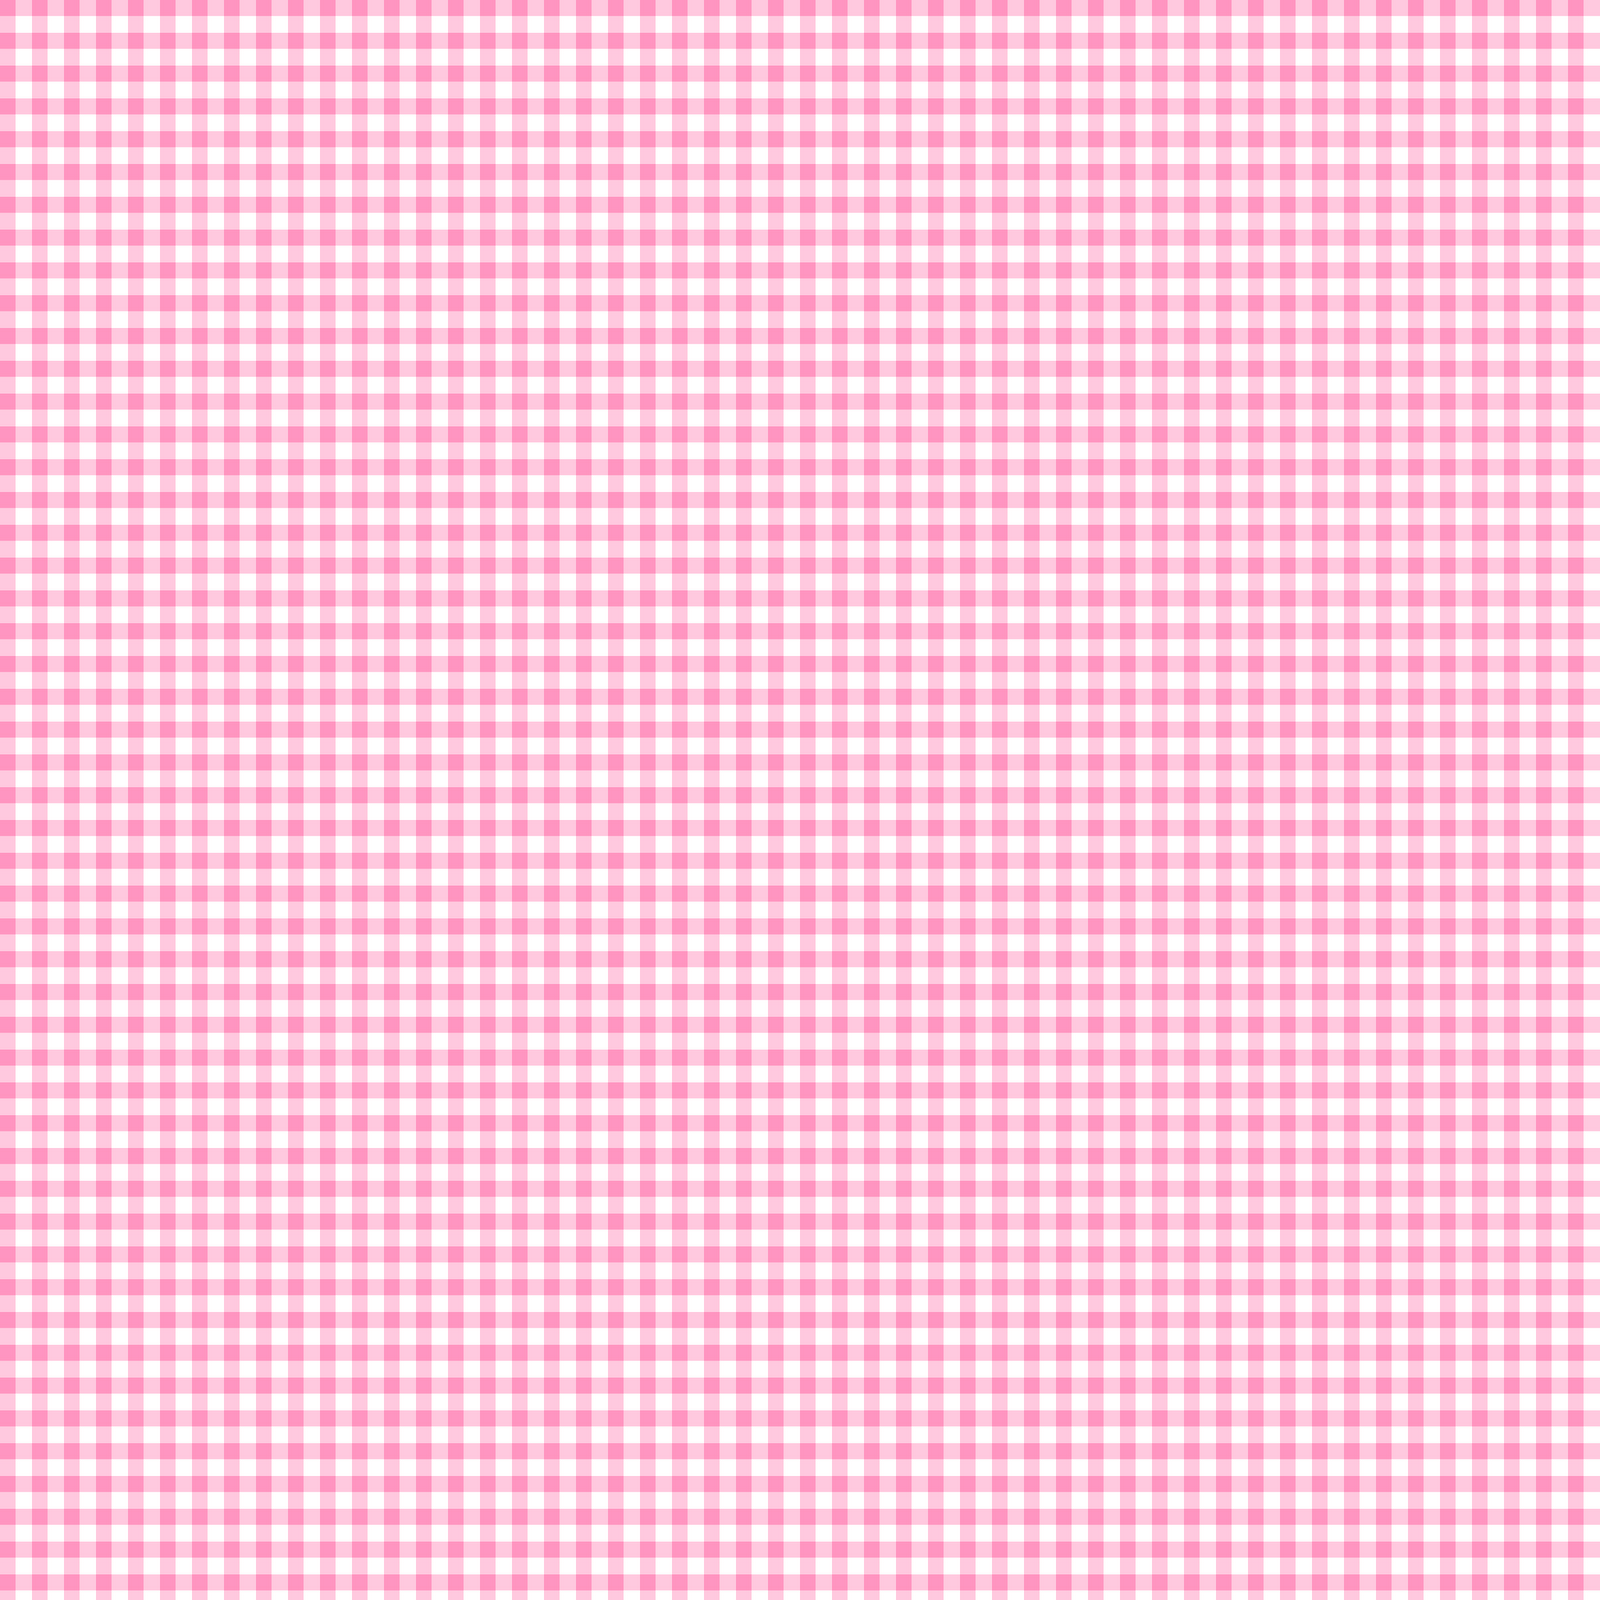 Red And White Checkered Wallpaper Wallpapersafari